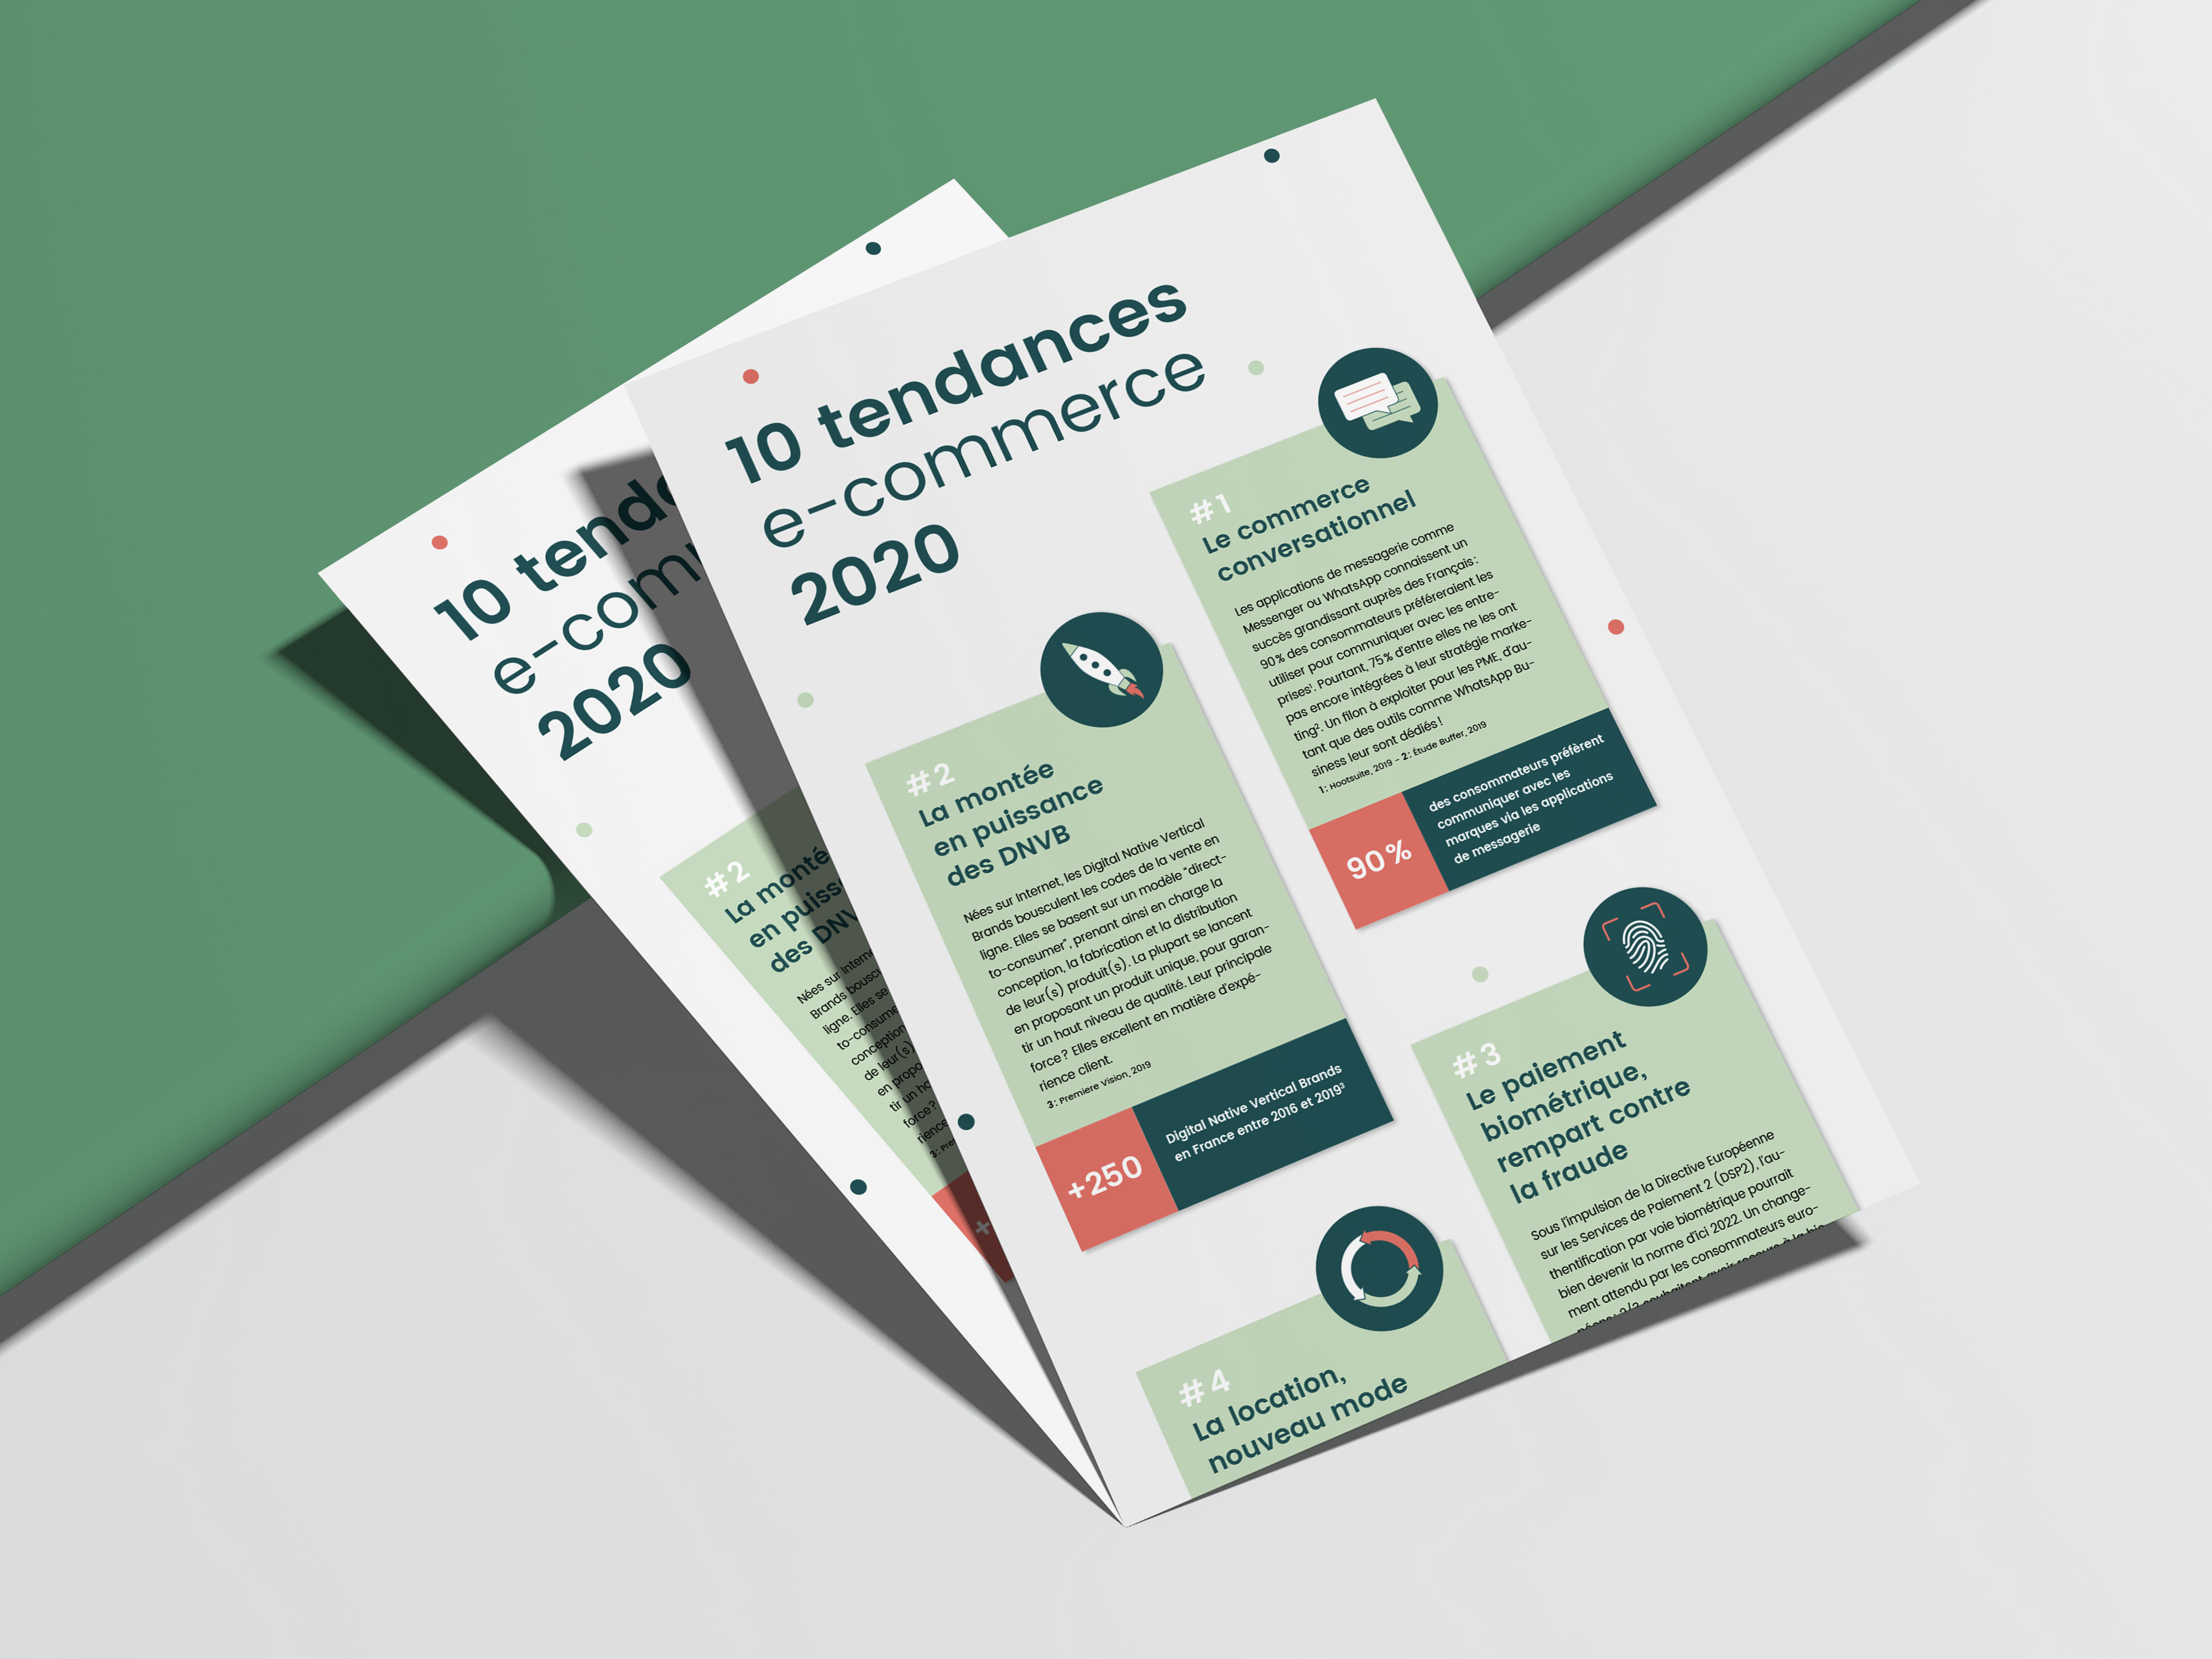 FR_MockUP_Infographie_10 tendances e-commerce 2020